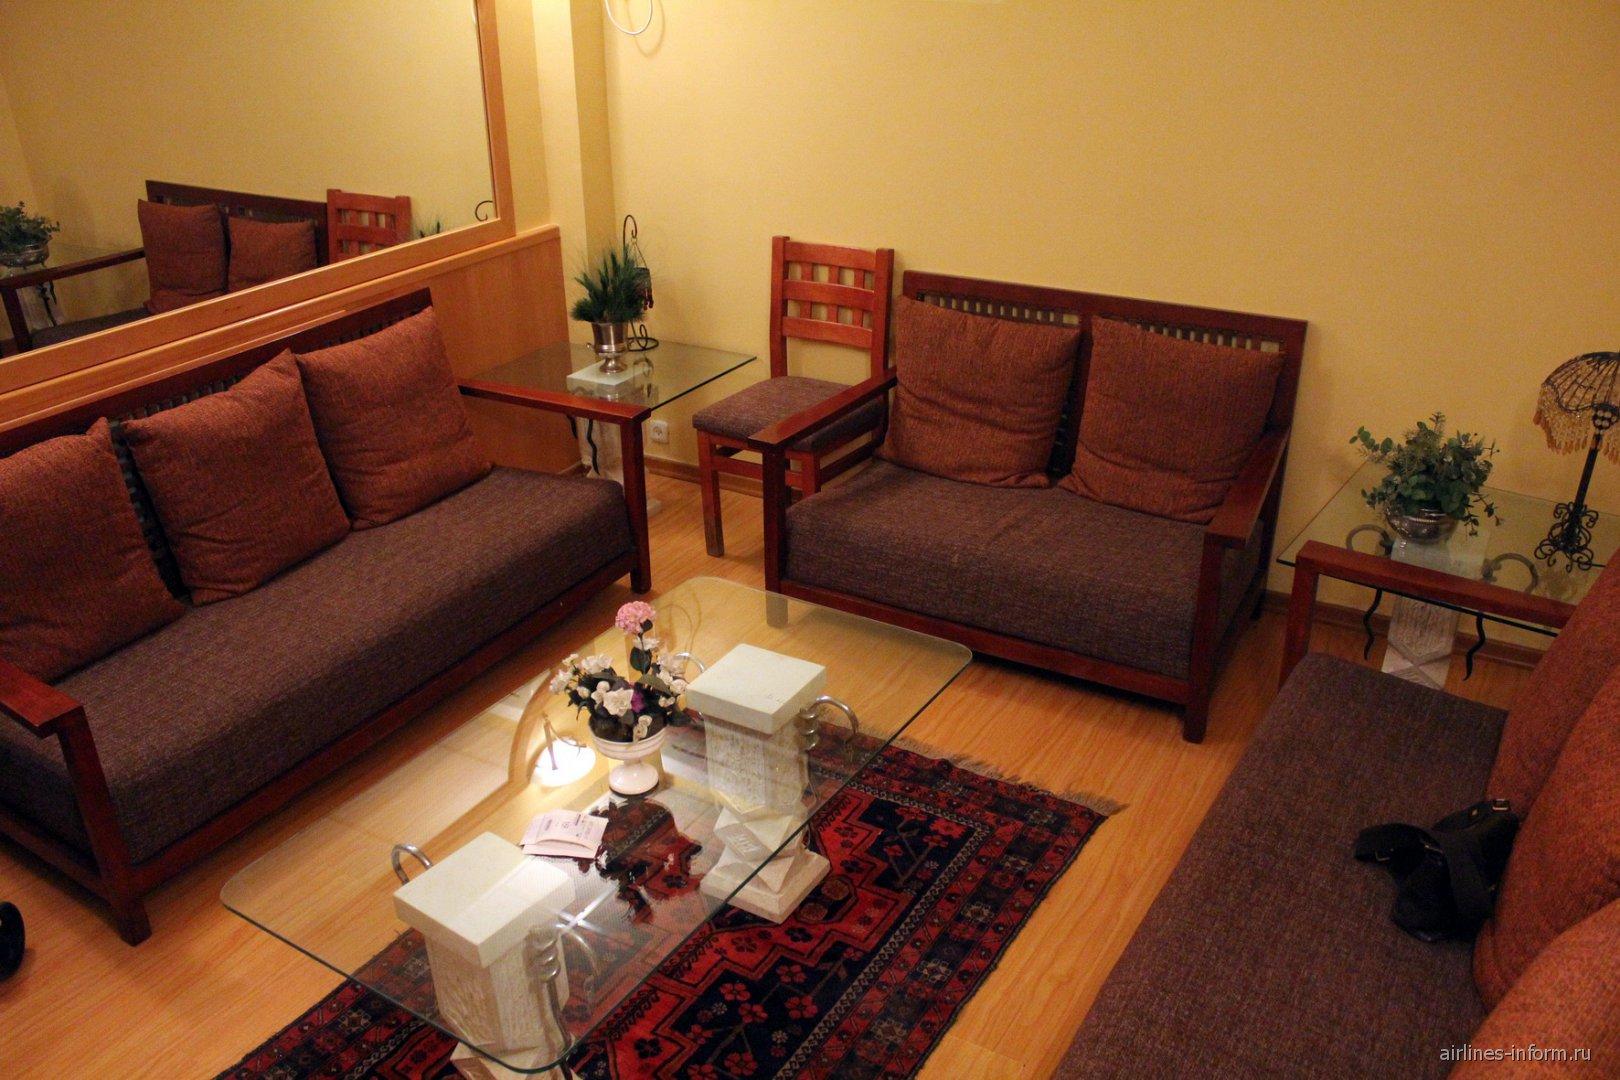 VIP-зал в аэропорту Эйлат